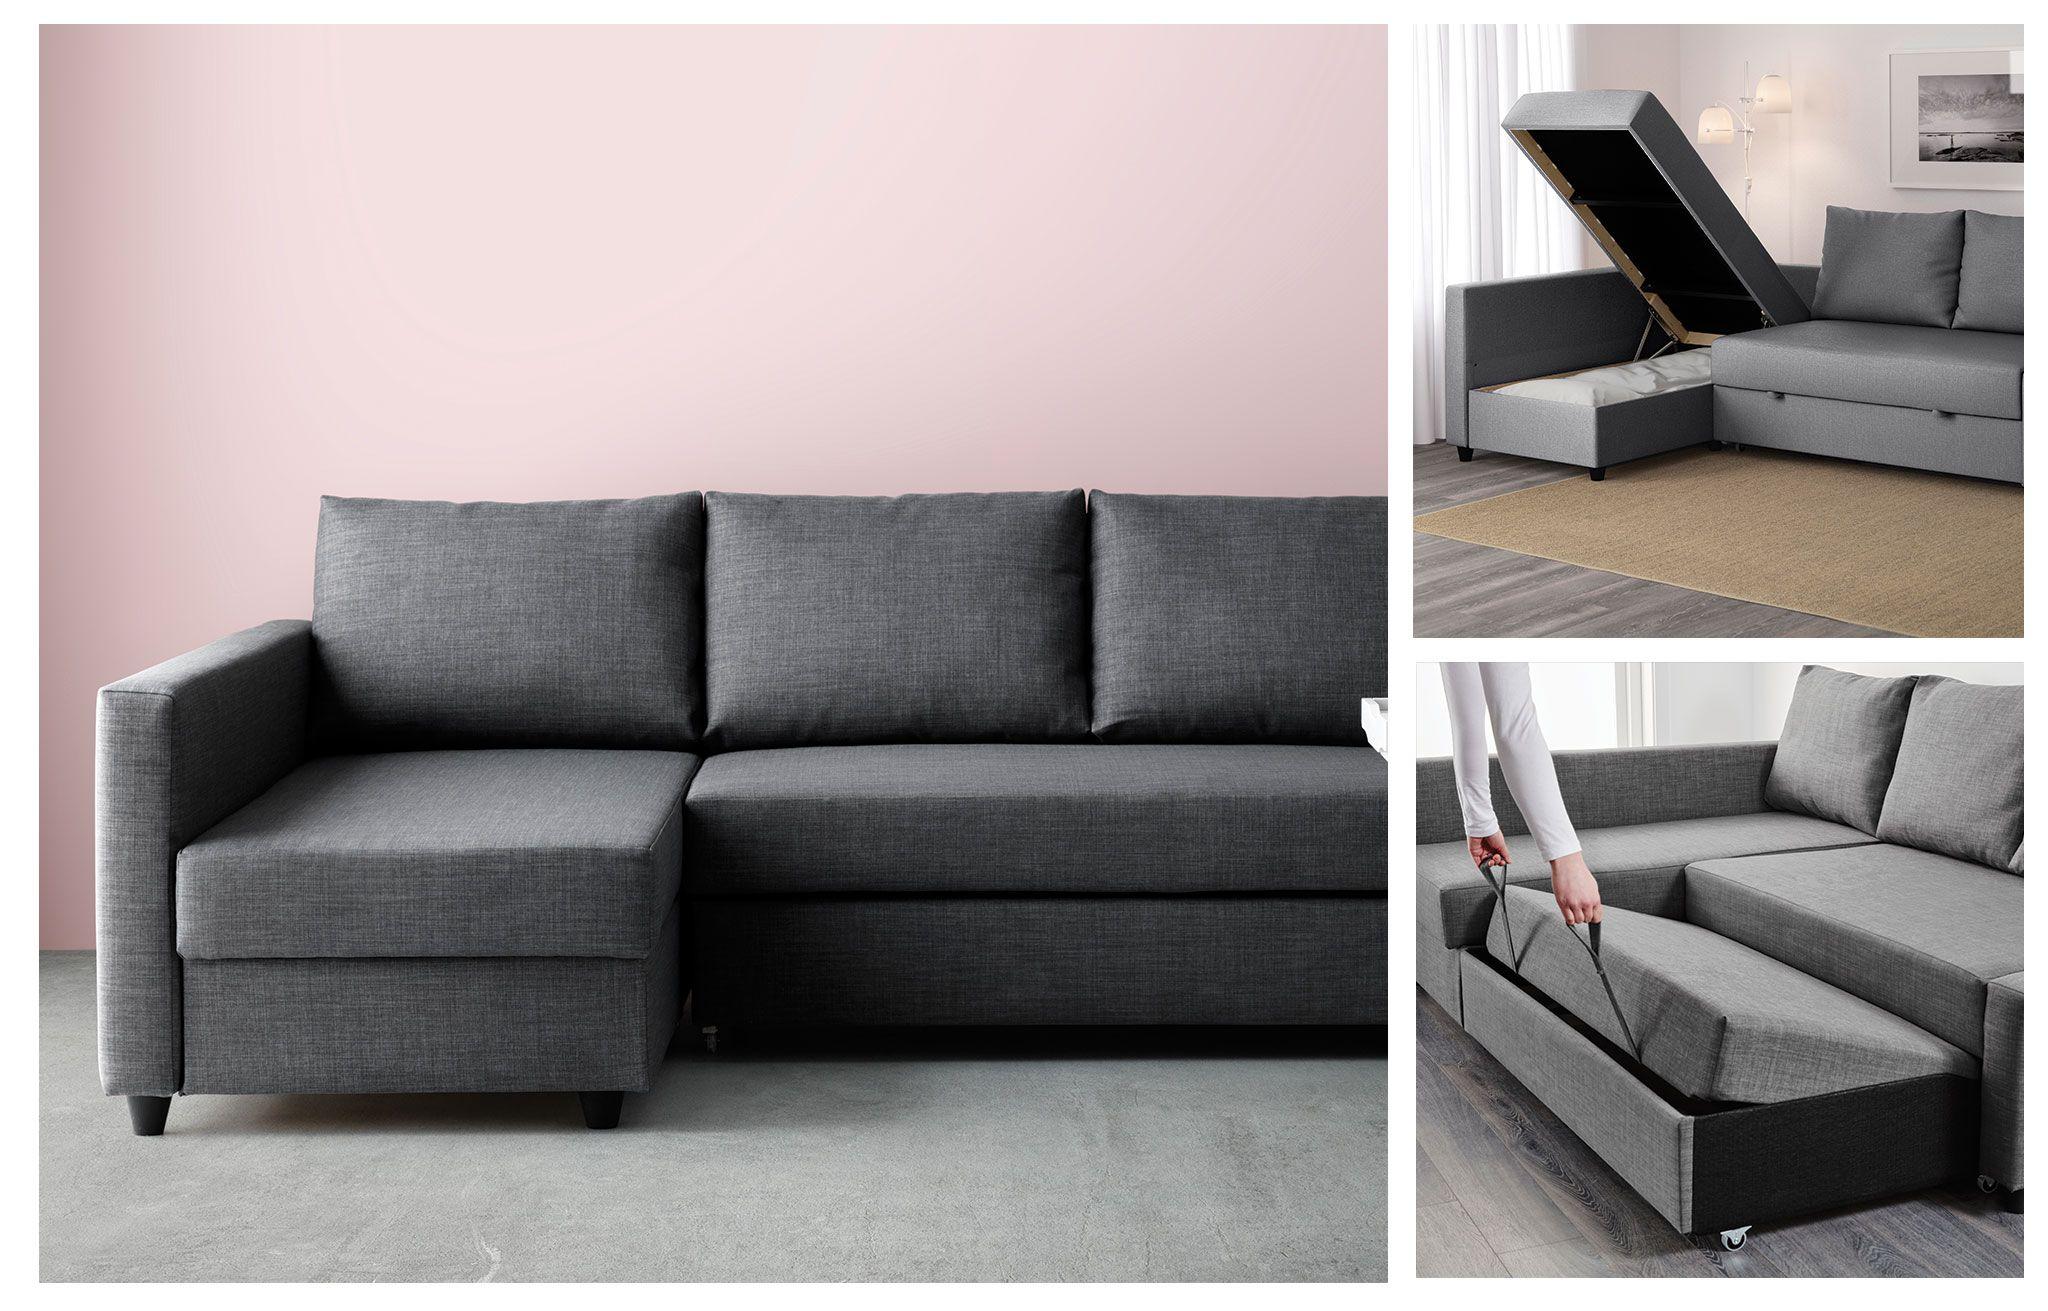 Remarkable Friheten Corner Sofa Bed With Storage Skiftebo Dark Grey Onthecornerstone Fun Painted Chair Ideas Images Onthecornerstoneorg